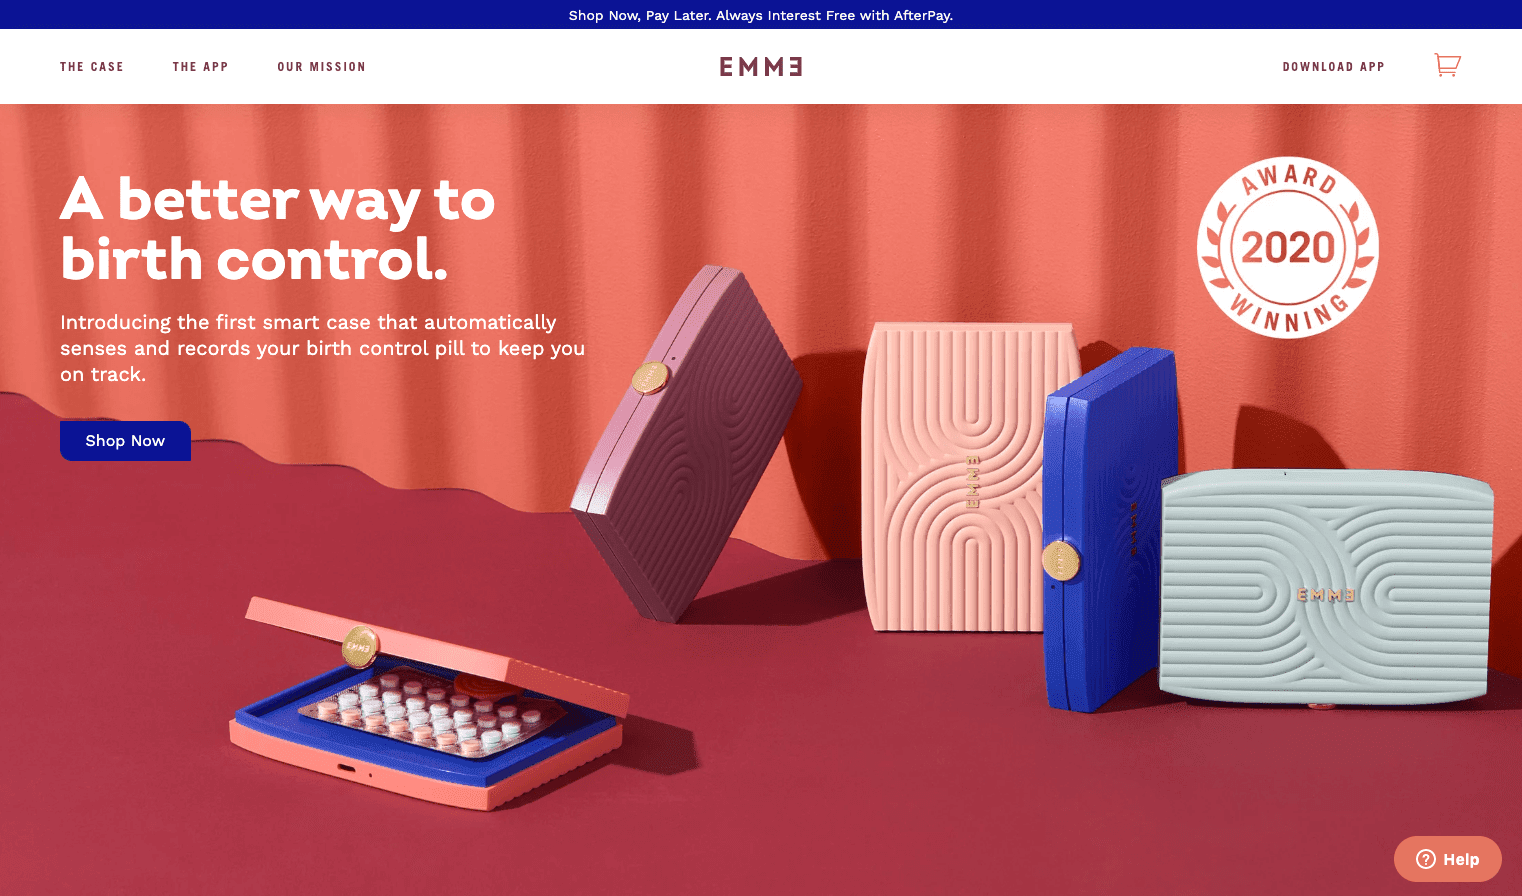 Emme webpage screenshot